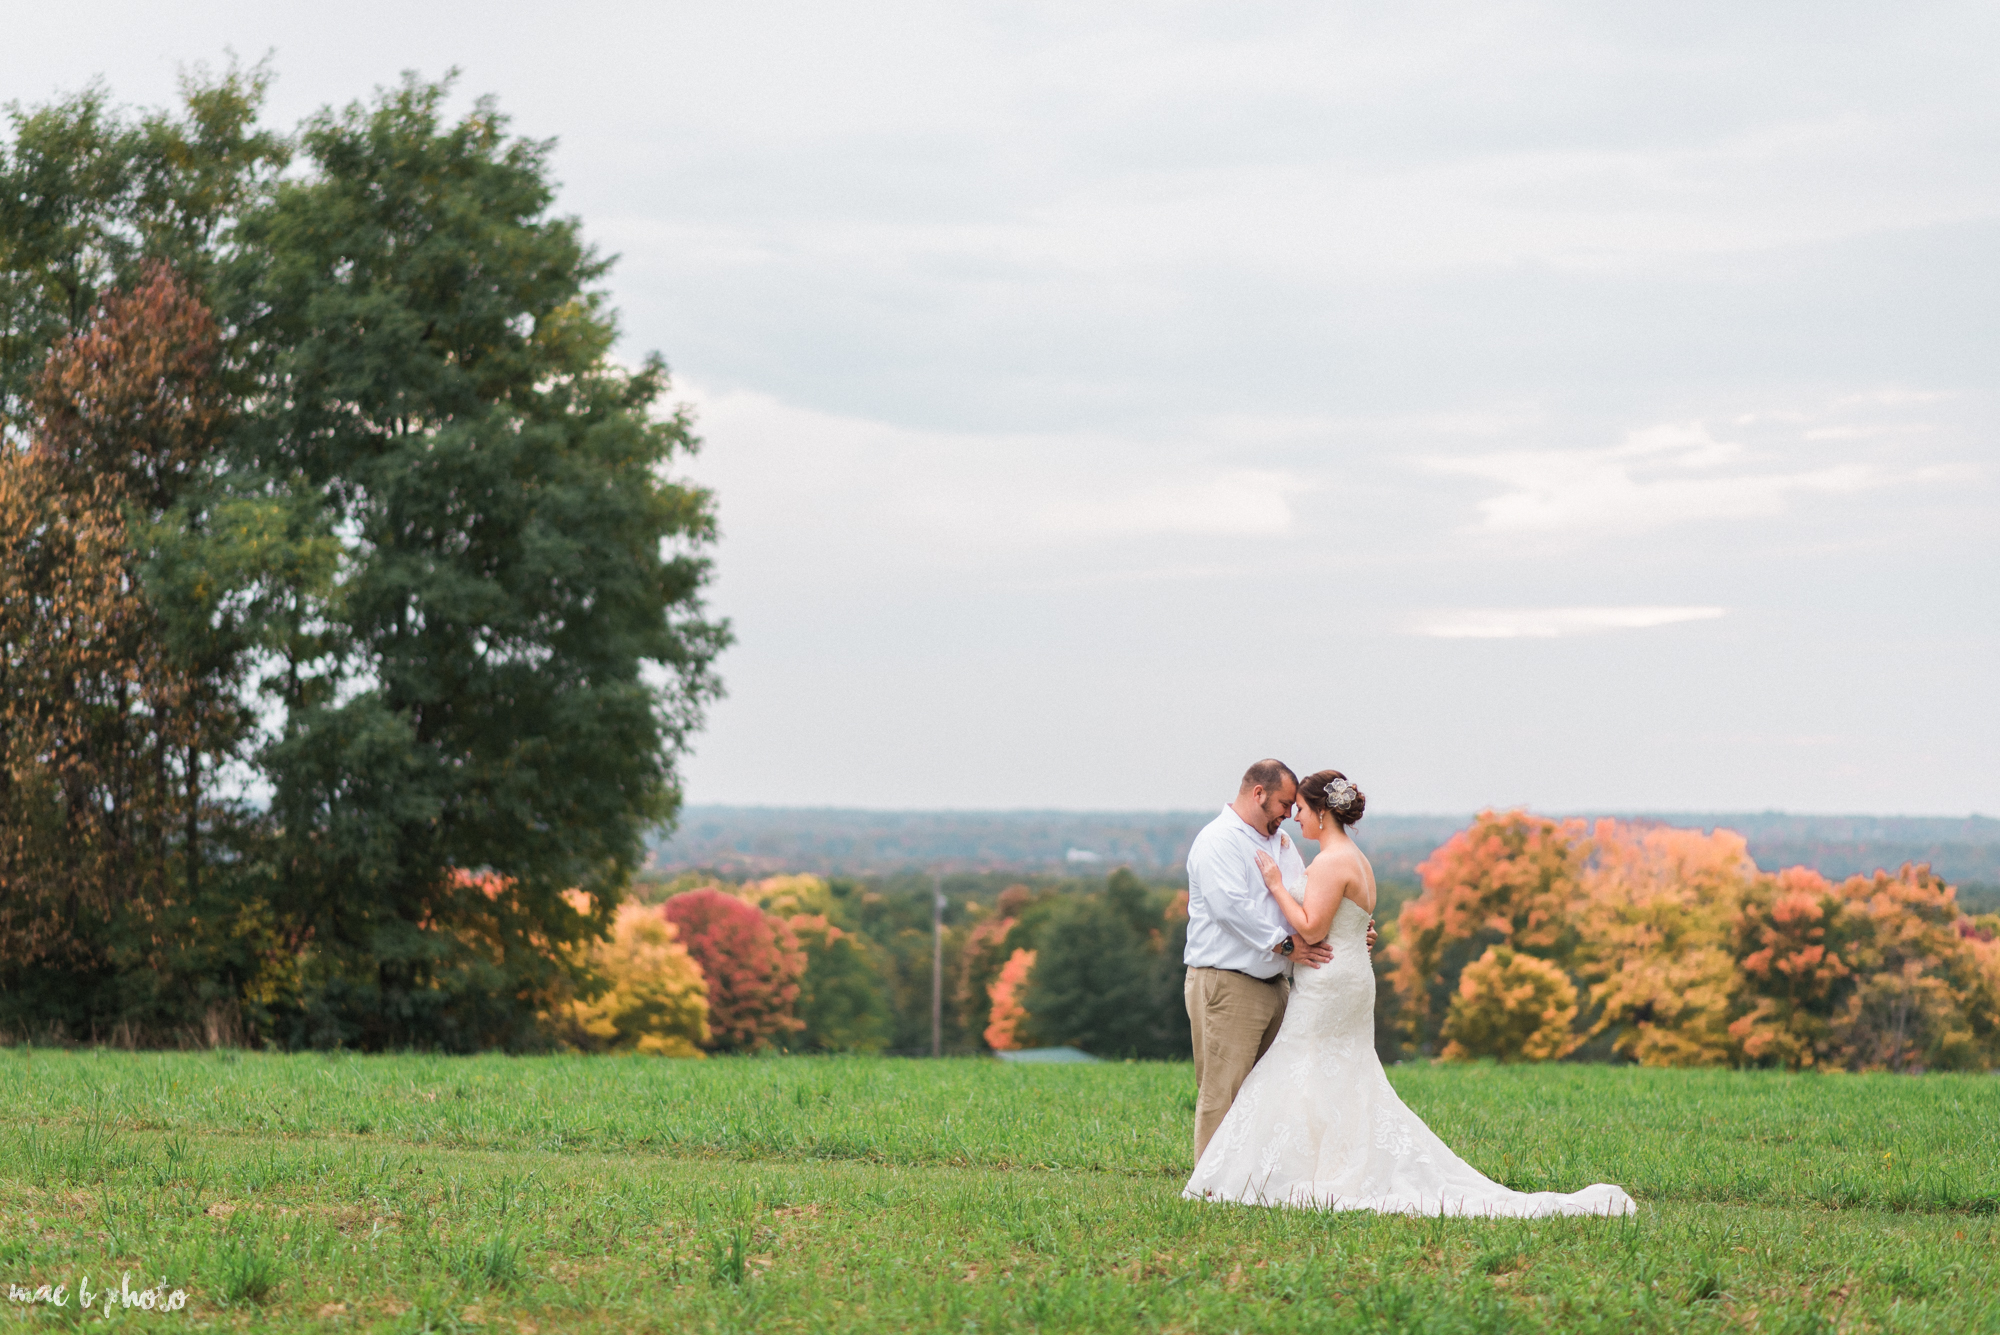 Sarah & Dustin's Rustic Chic Barn Wedding at Hartford Hill Winery in Hartford, Ohio by Mae B Photo-67.jpg